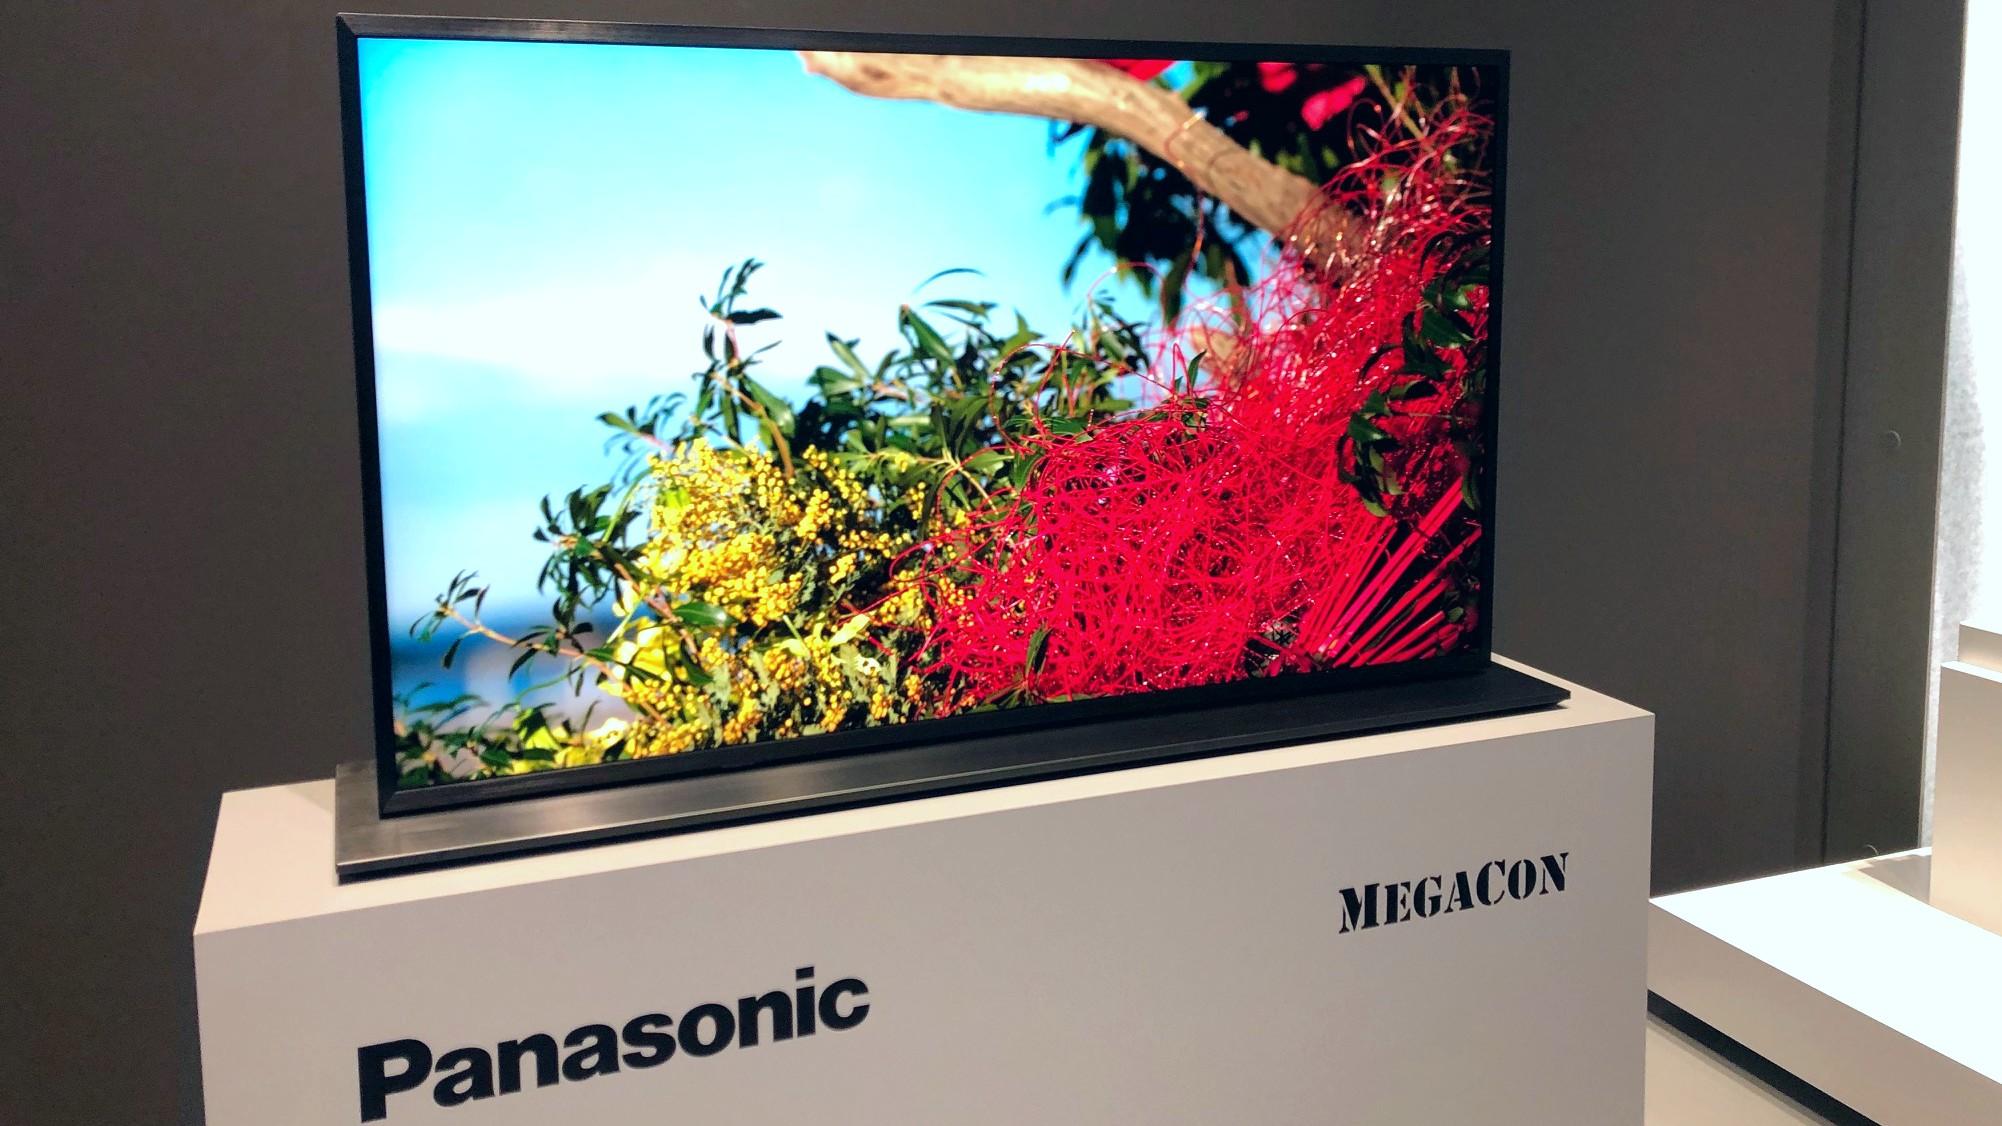 First look: Panasonic MegaCon 4K Dual Panel LCD TV | TechRadar